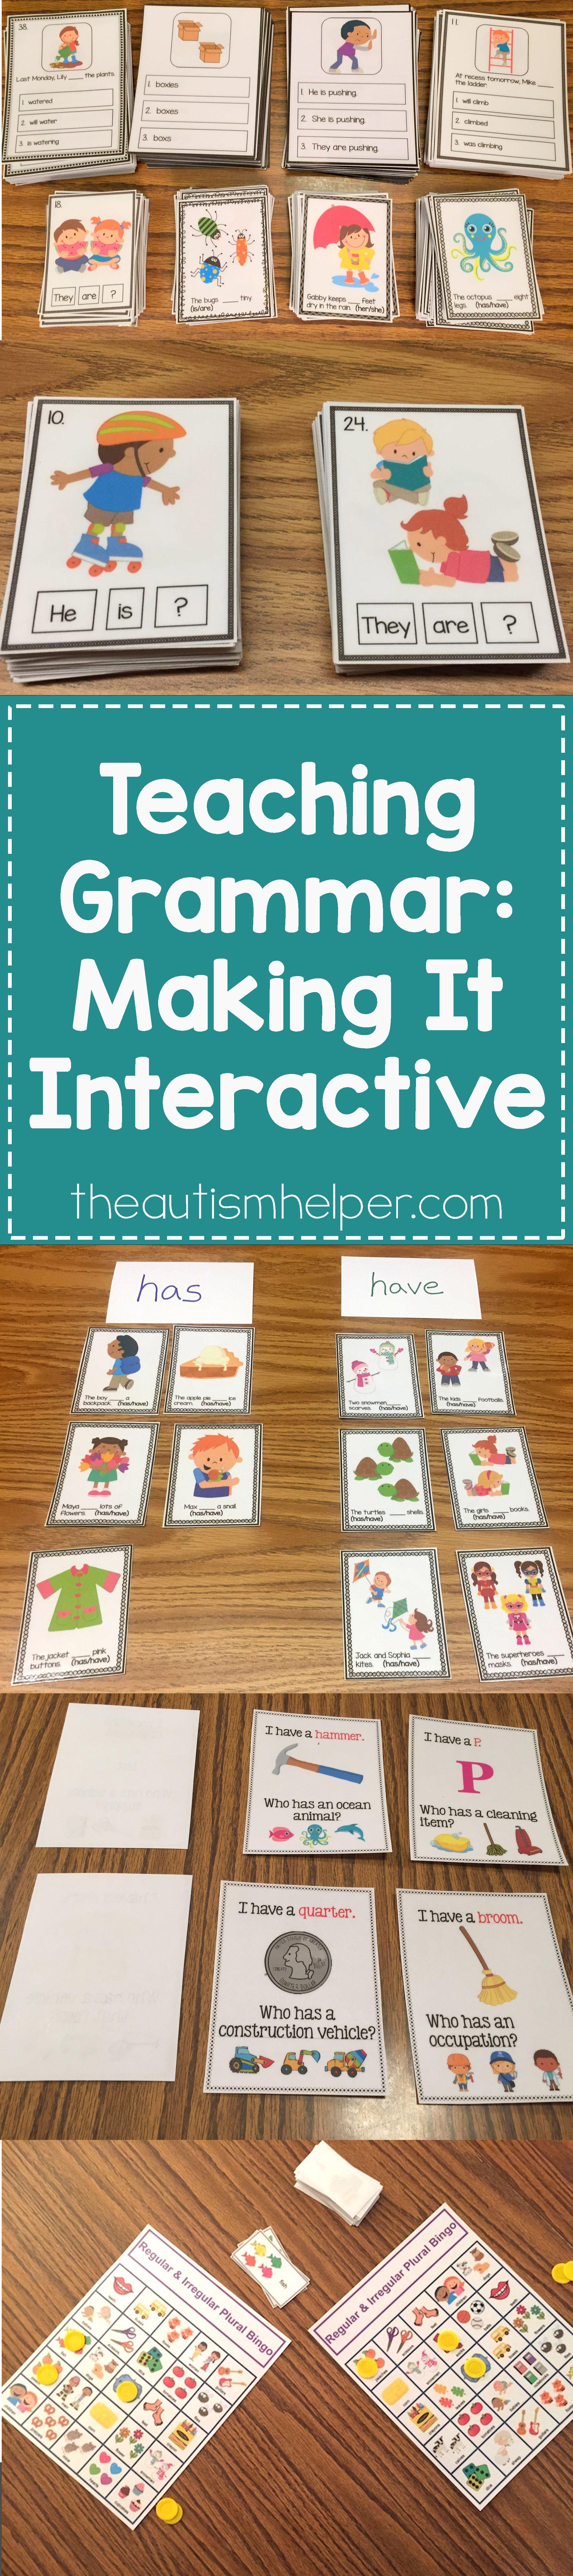 Teaching Grammar Making It Interactive